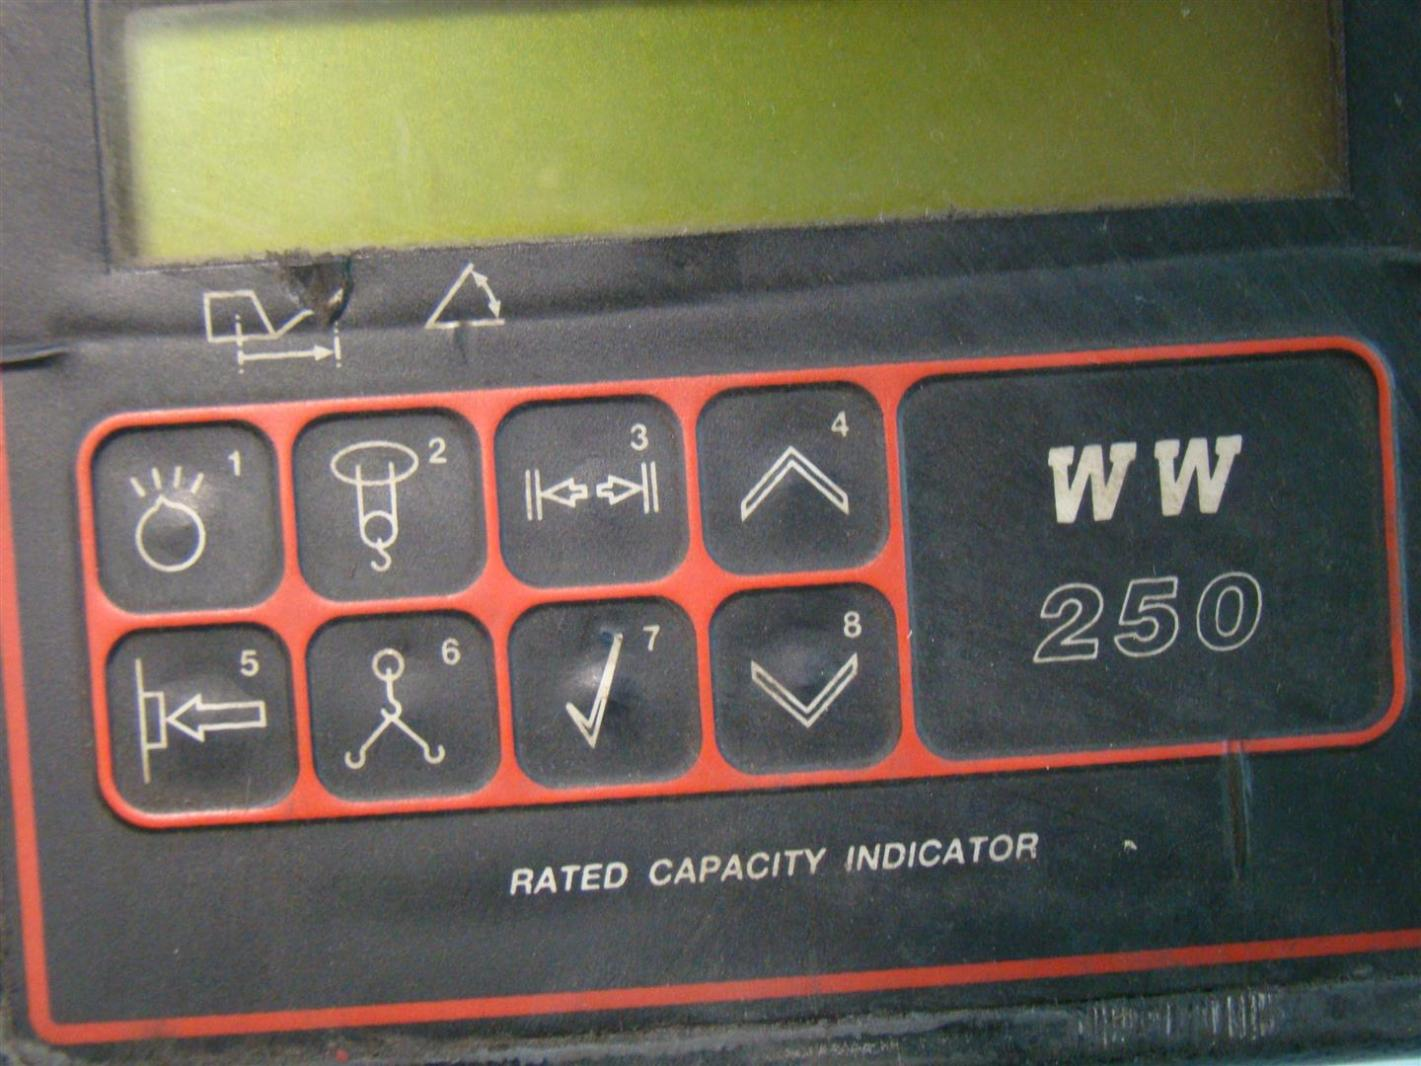 Safe Load Indicator Systems : Wylie ww crane safe load indicator d ebay